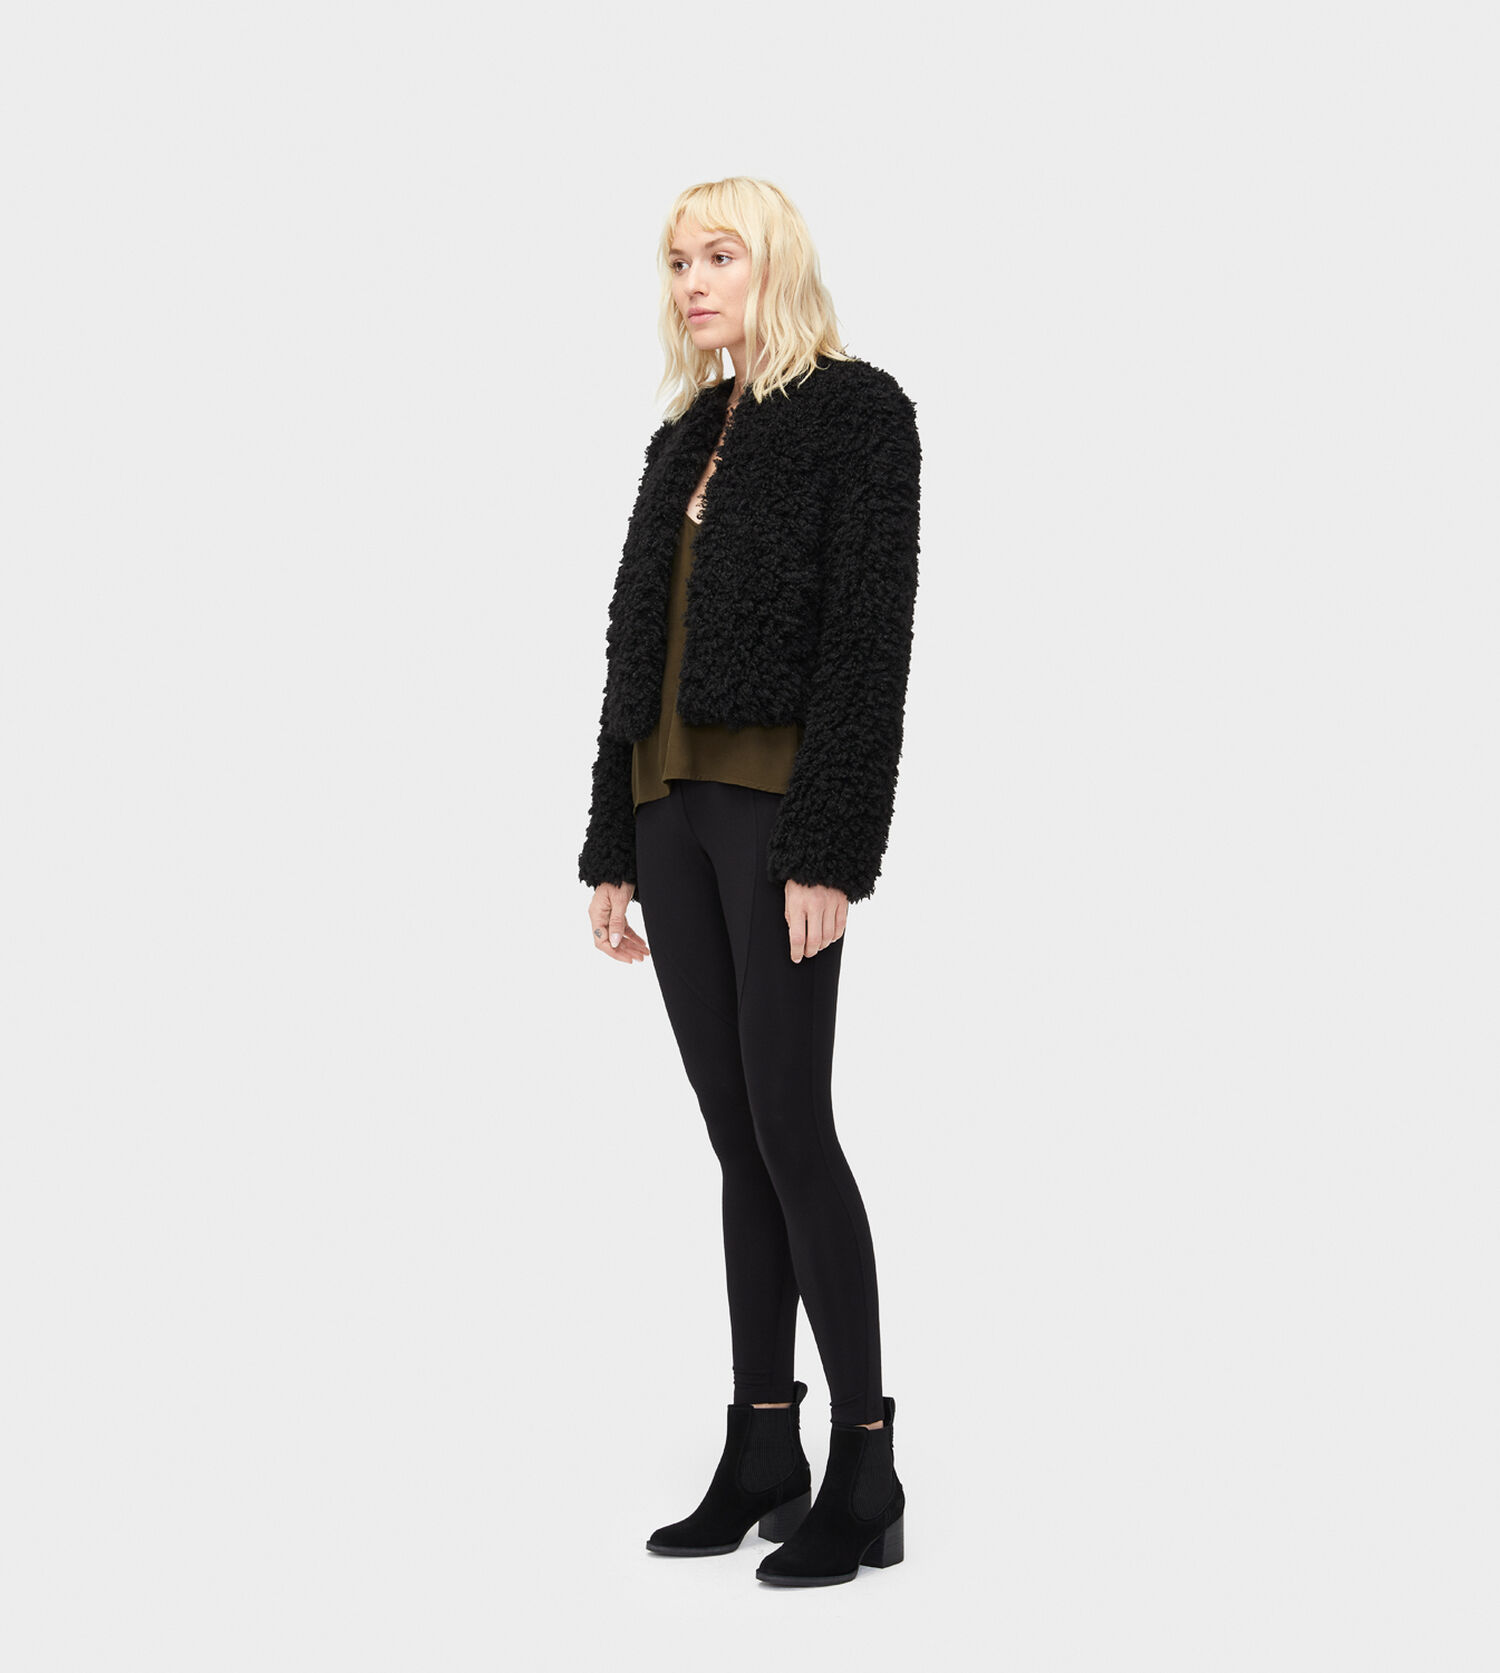 14677042cbc9 Zoom Lorrena Faux Fur Jacket - Image 4 of 5